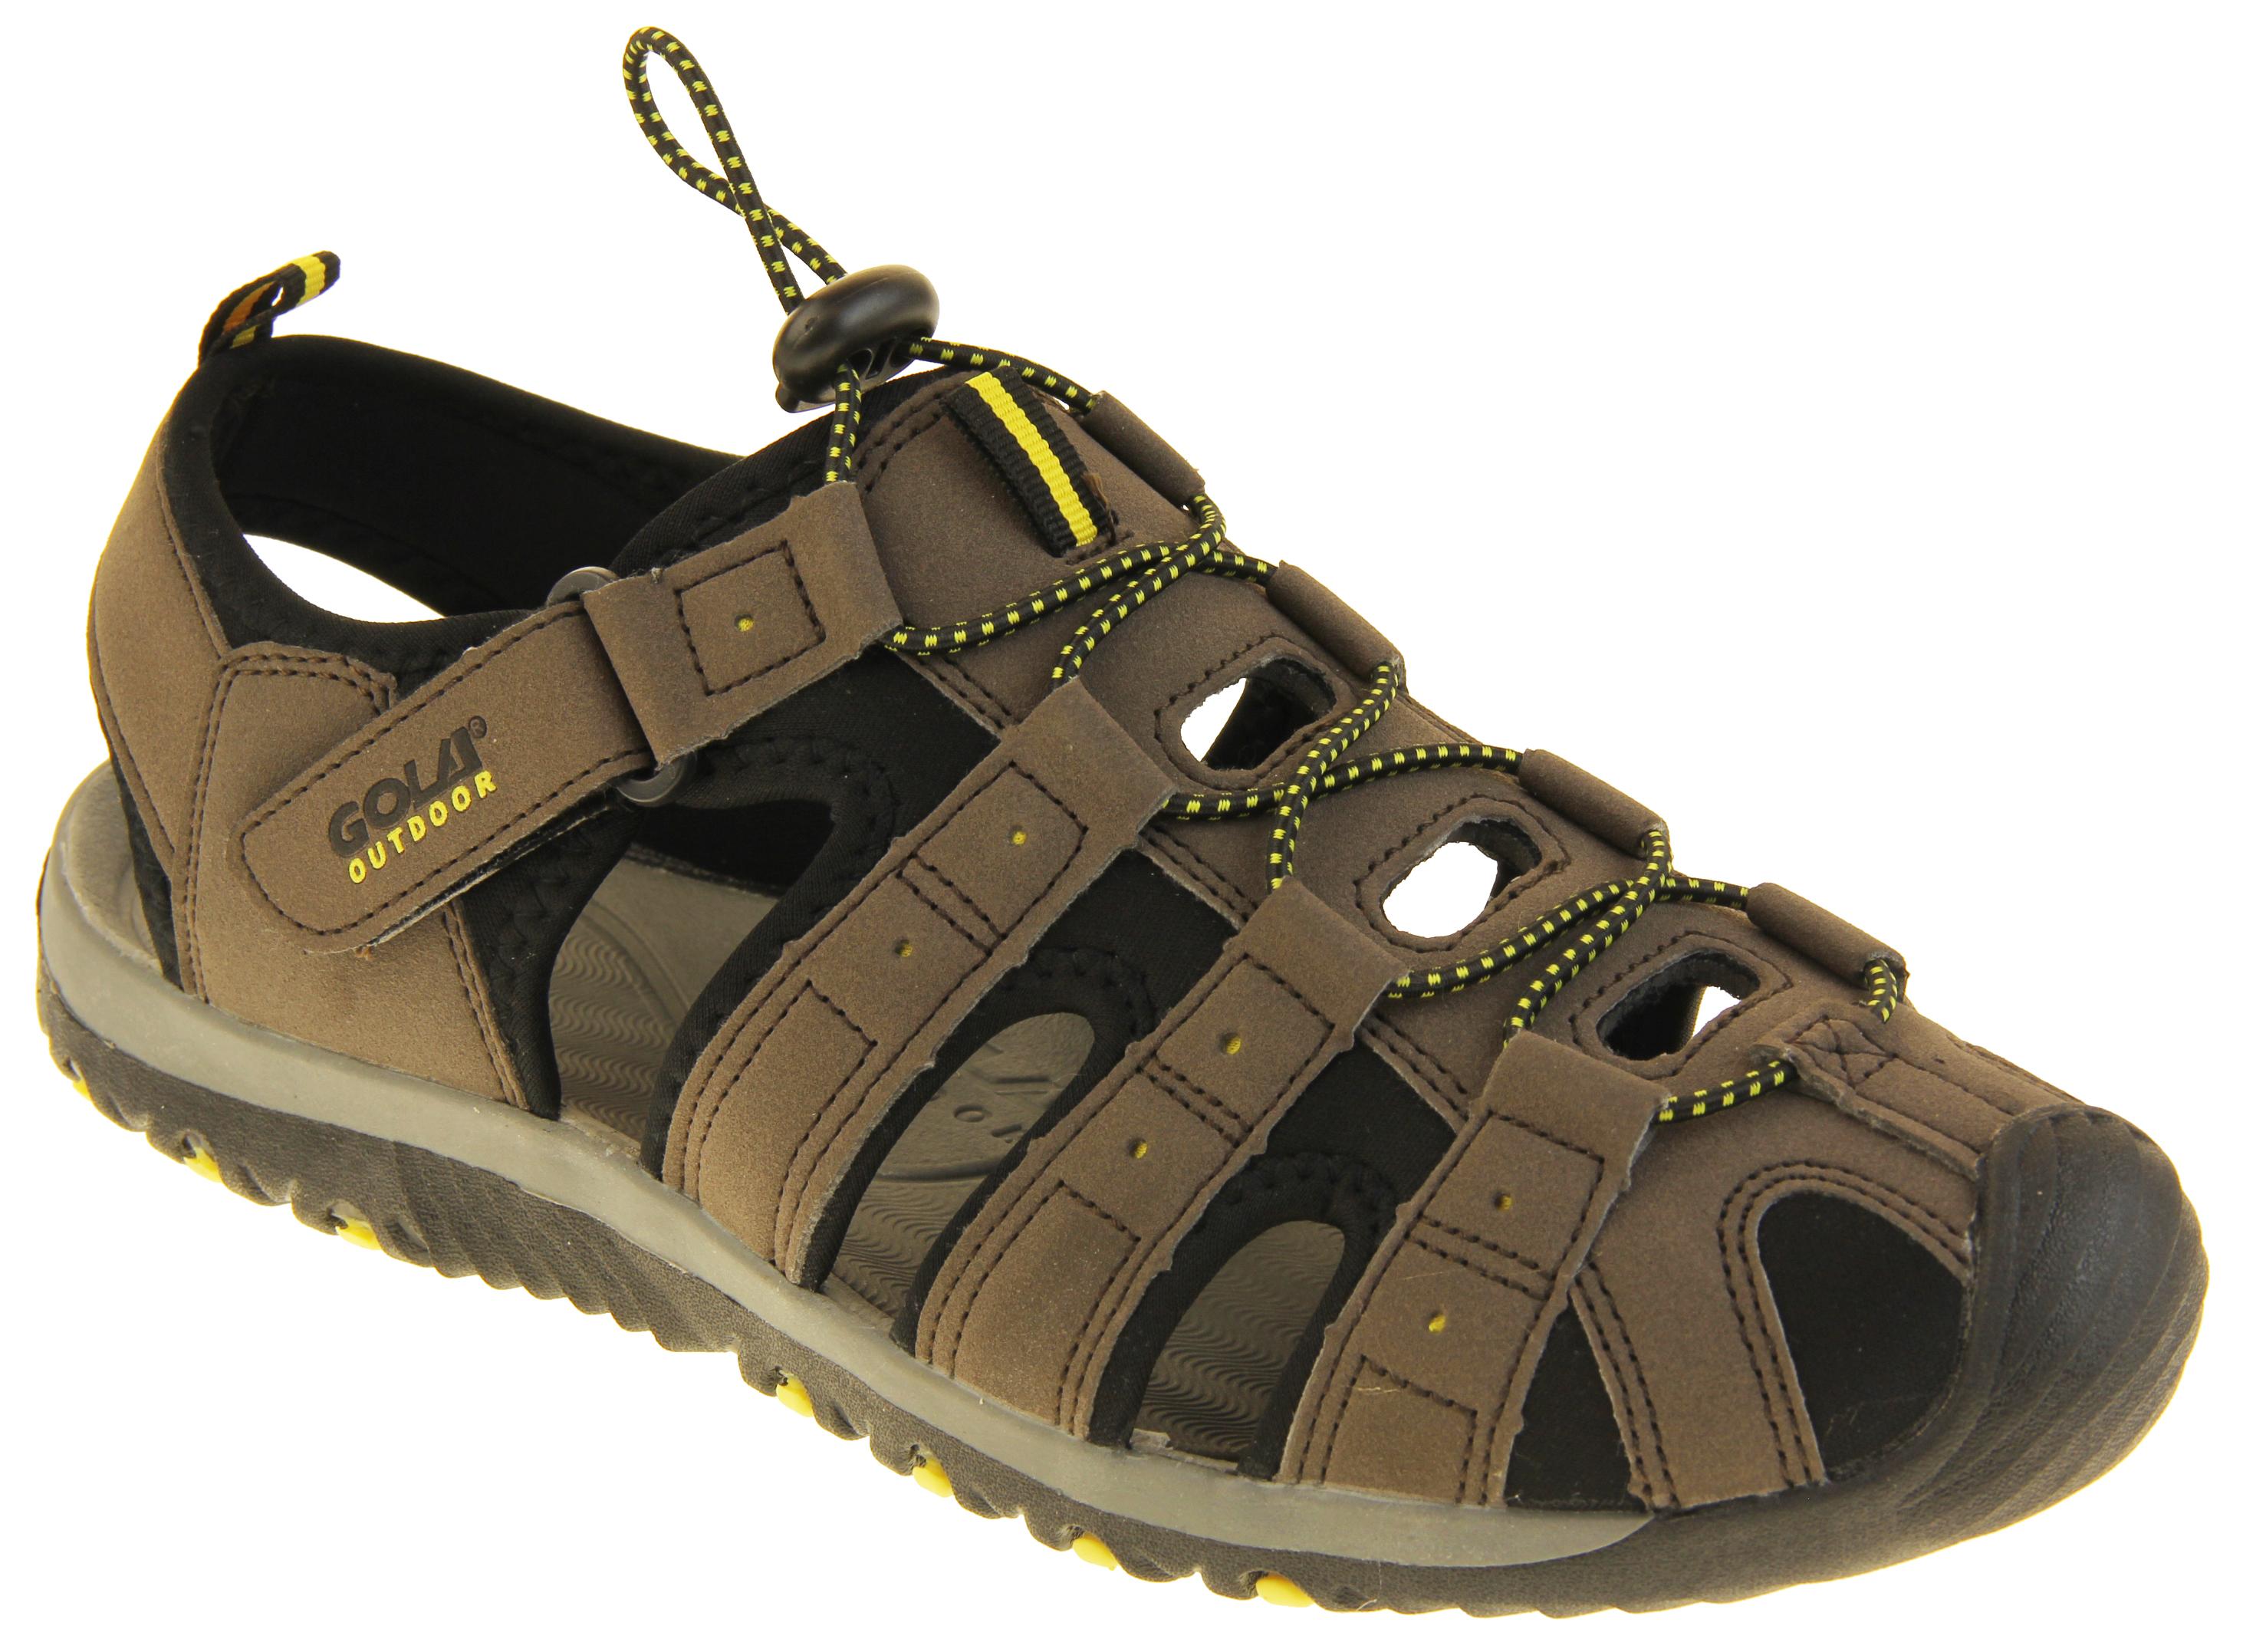 Boys trespass trekking sandals walking casual sandals uk 10 11 12 13